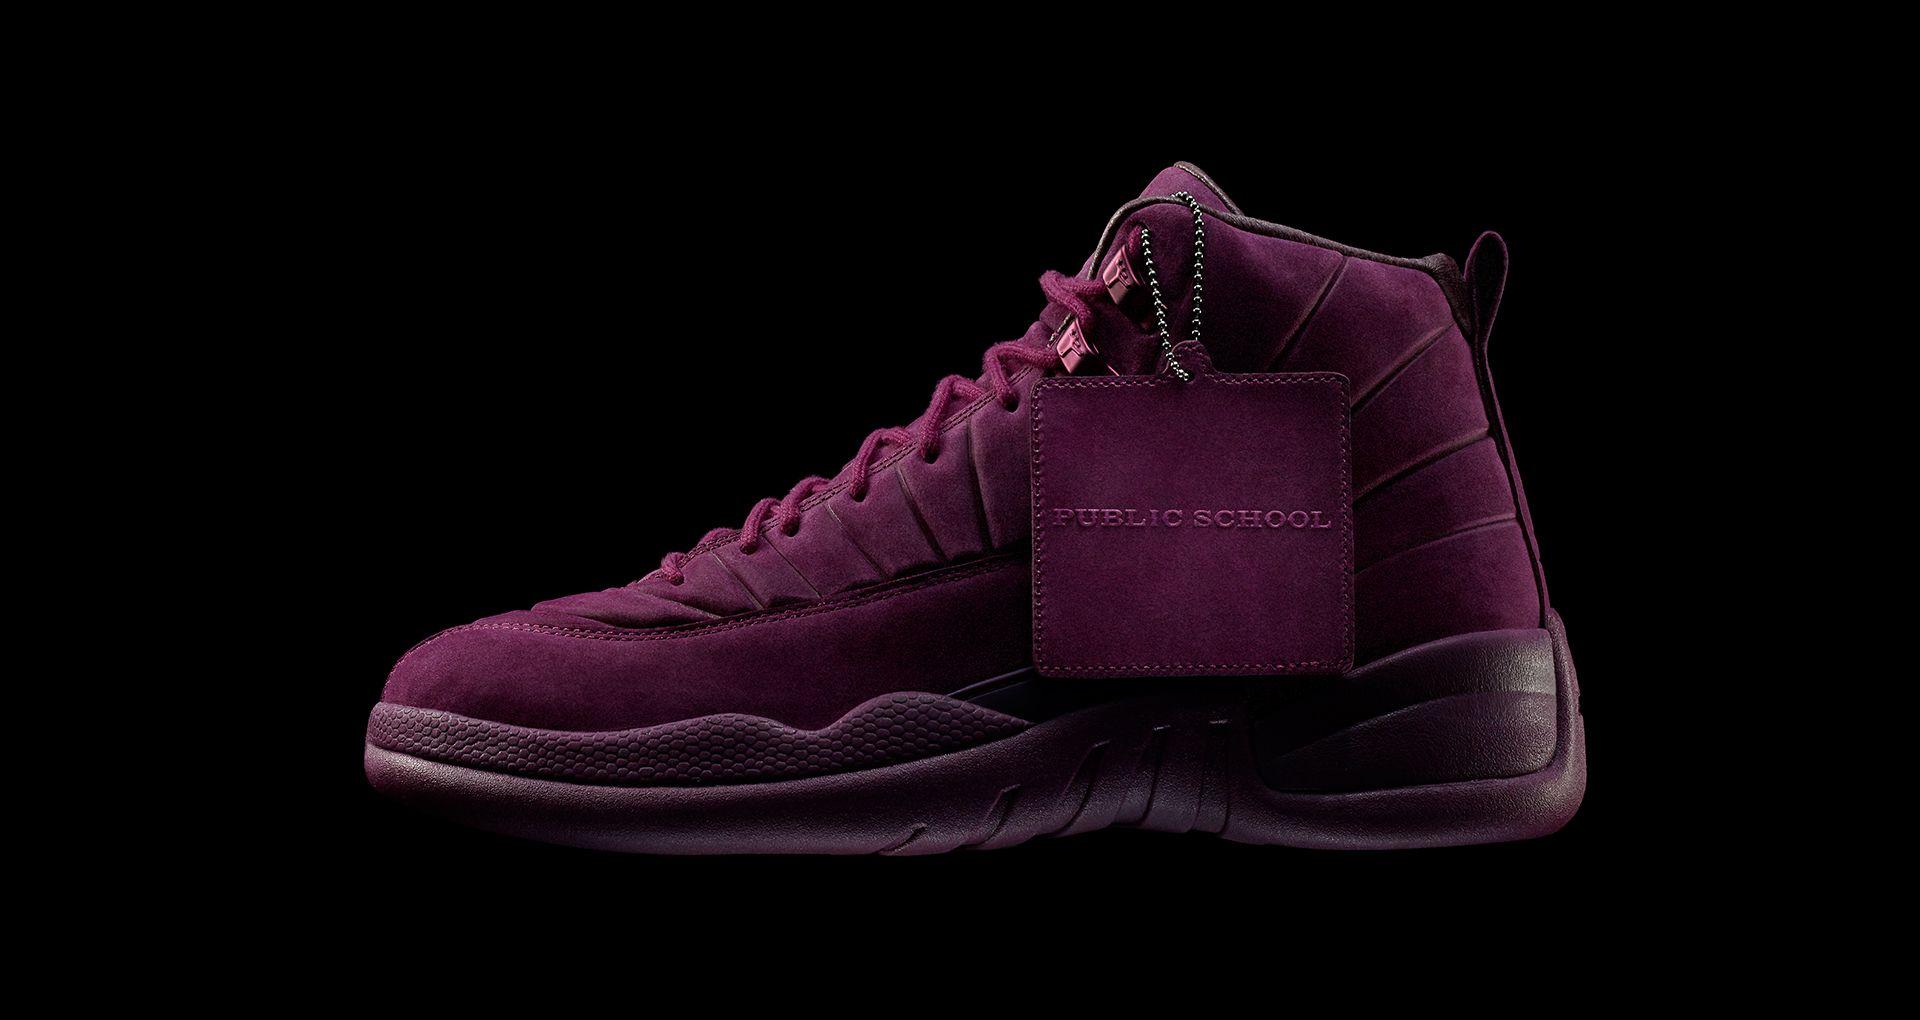 587f254140d Air Jordan 12 Retro PSNY 'Bordeaux' Release Date. Nike+ Launch GB